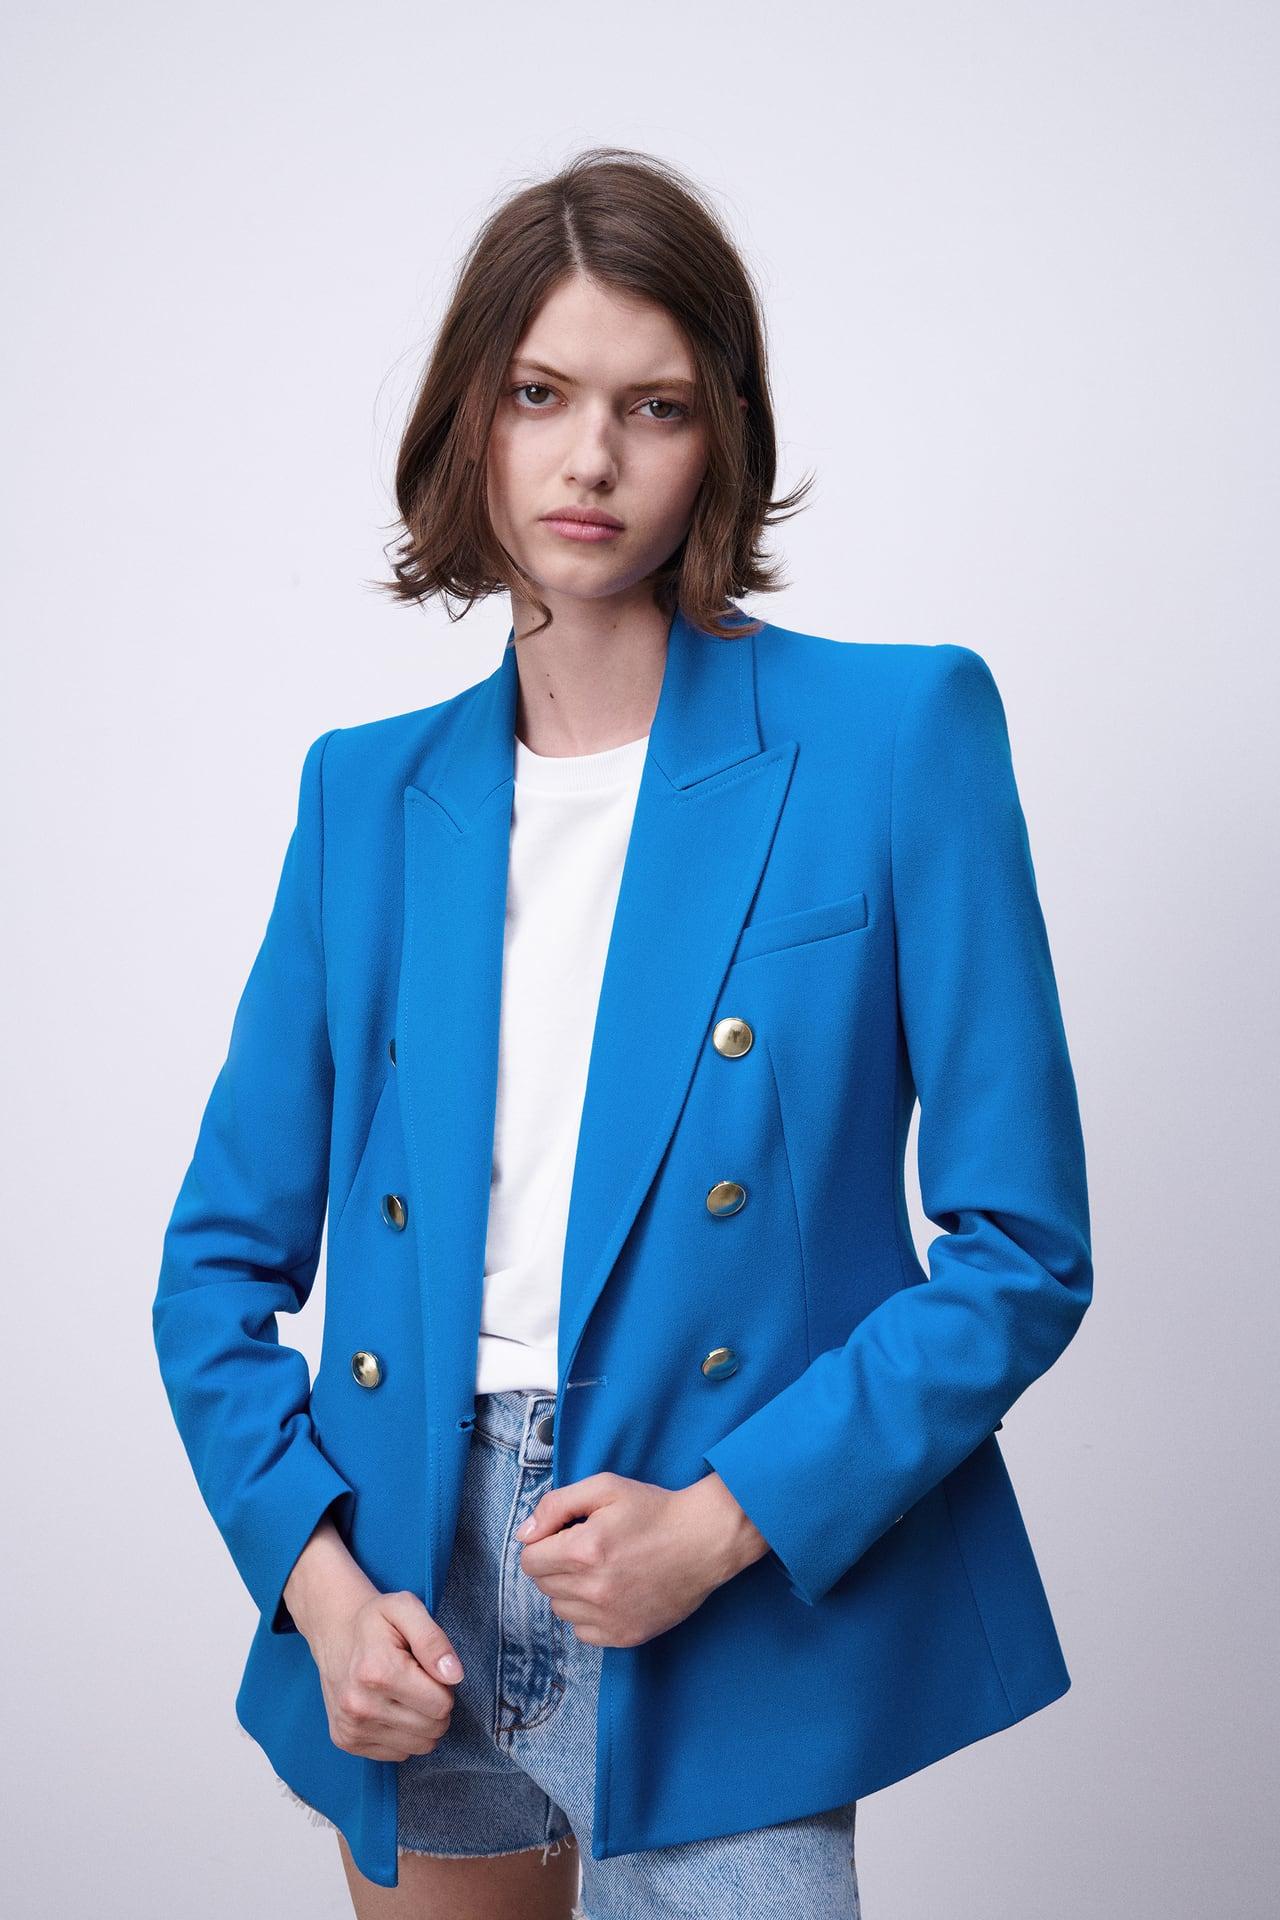 La blazer de una reina, esta es la prenda de Zara que viste a Kate Middleton